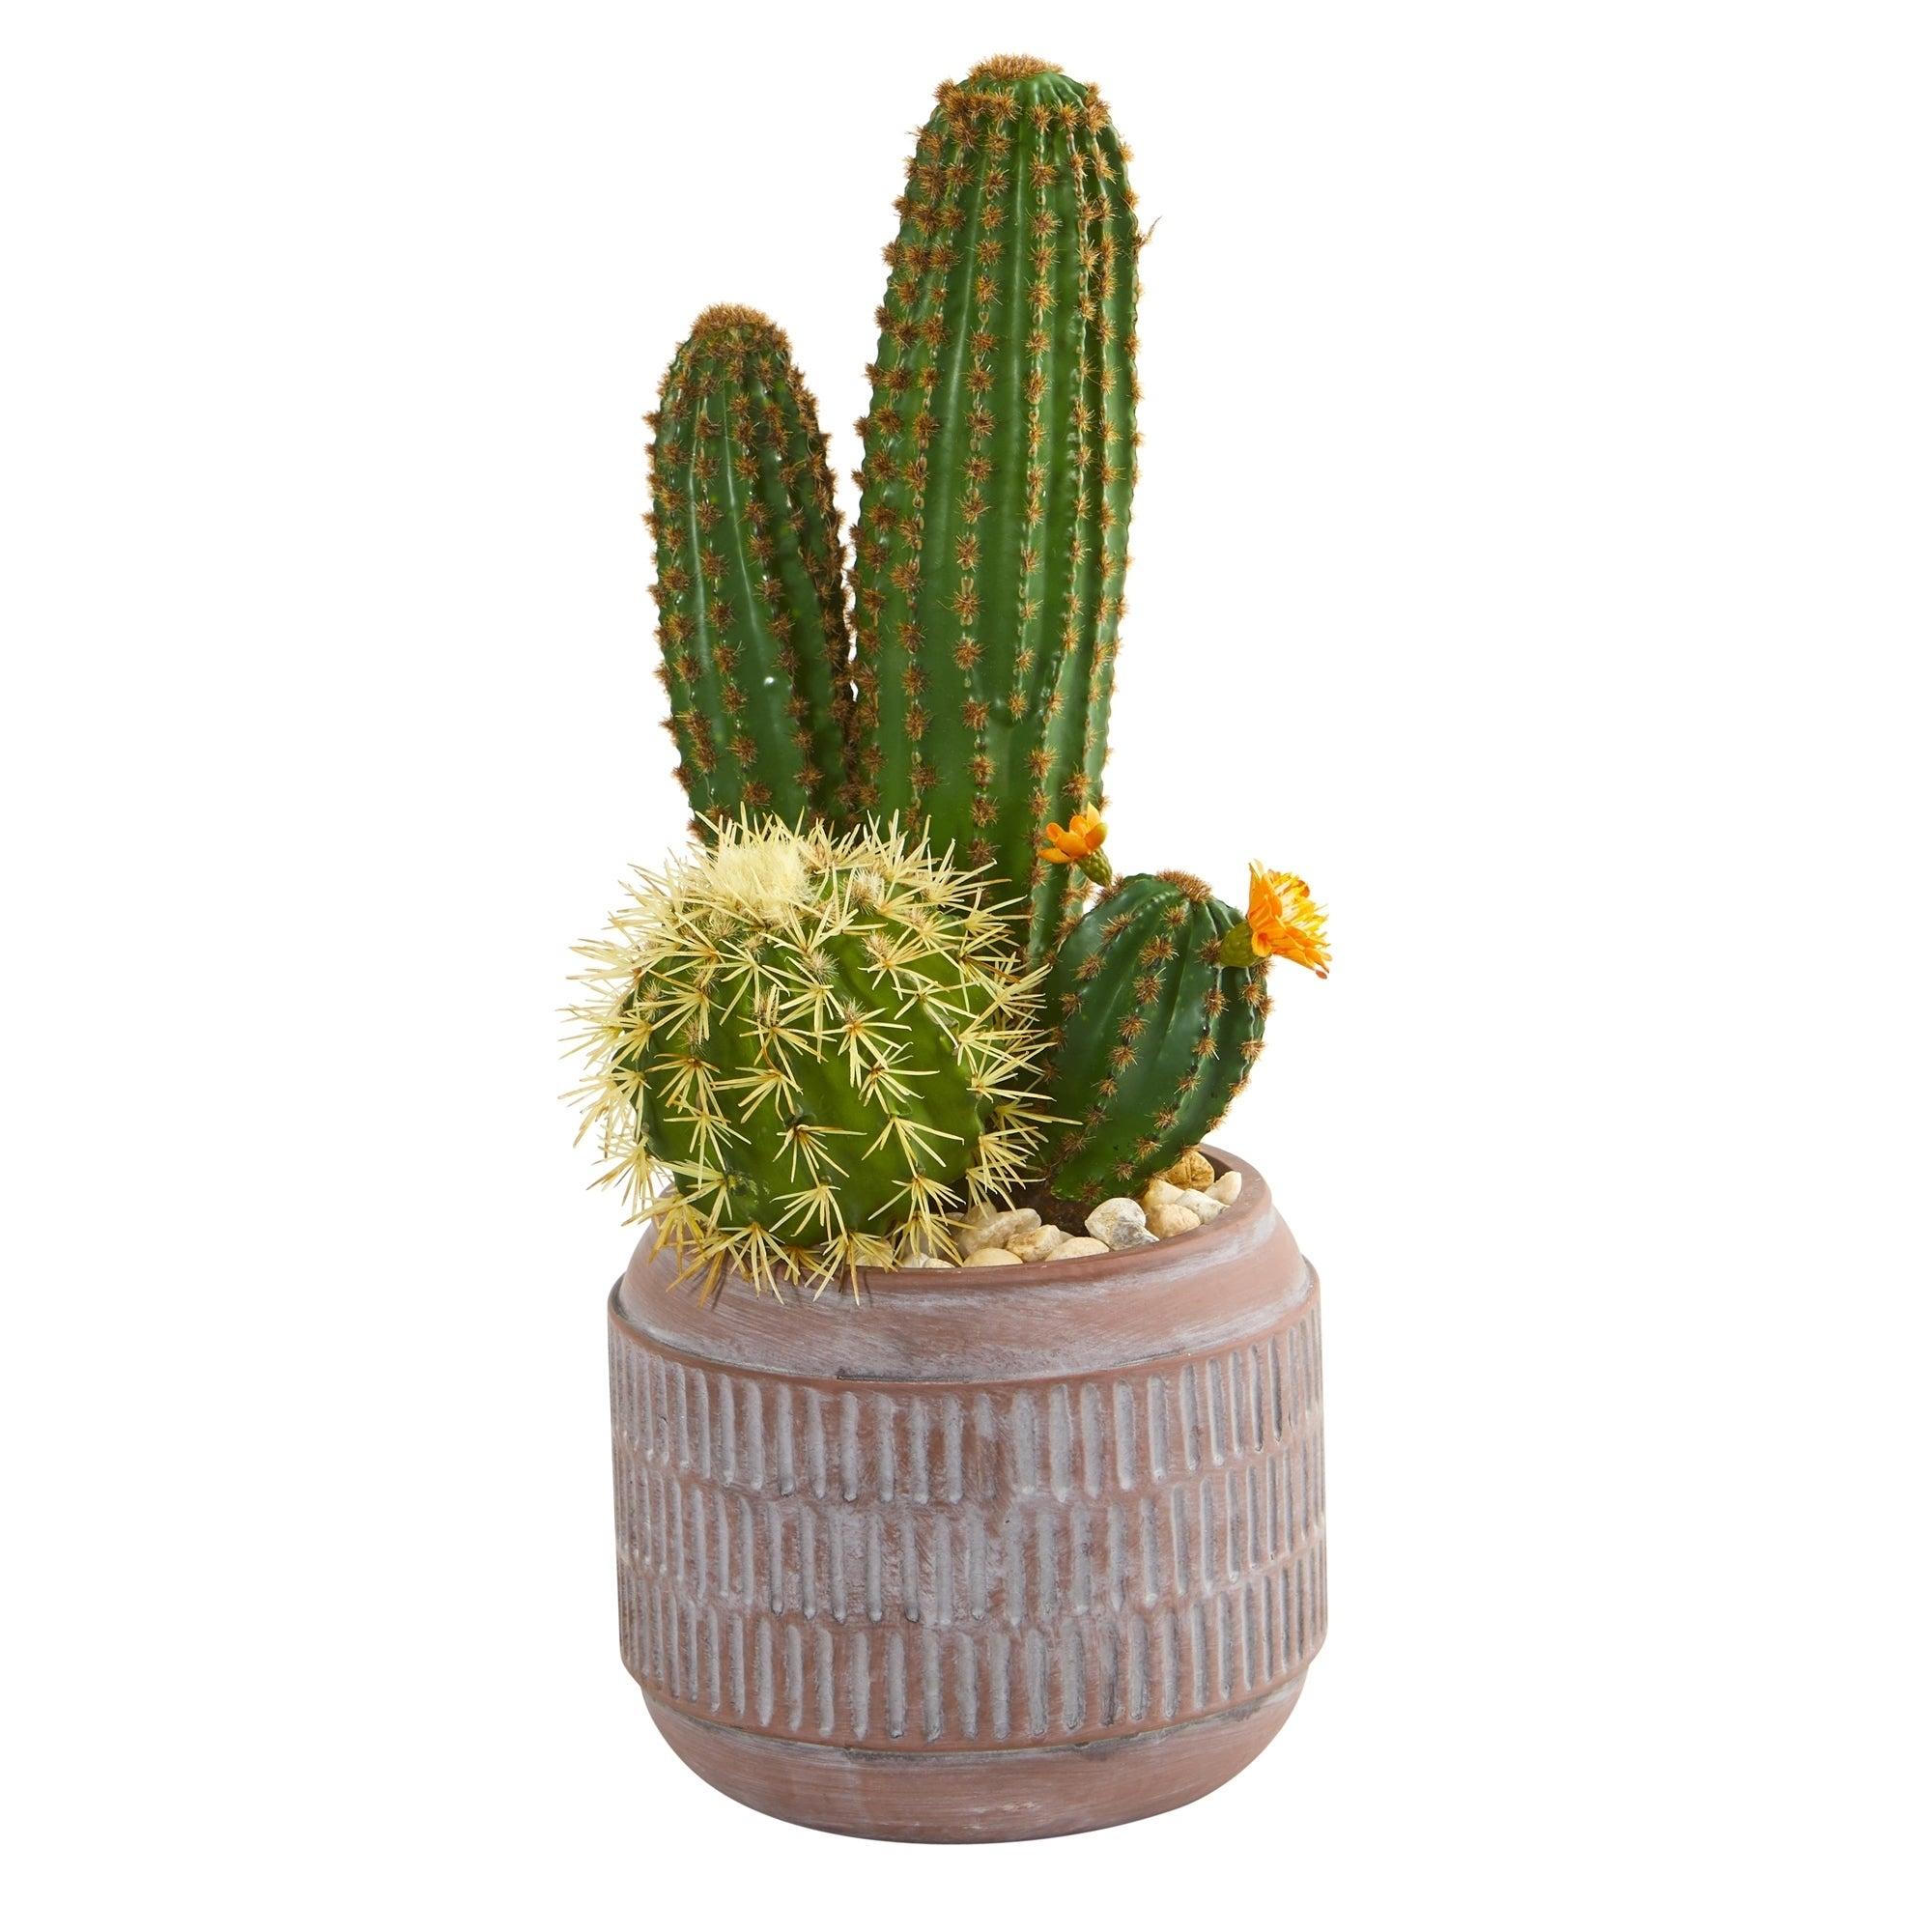 19 Cactus Artificial Plant in Decorative Planter